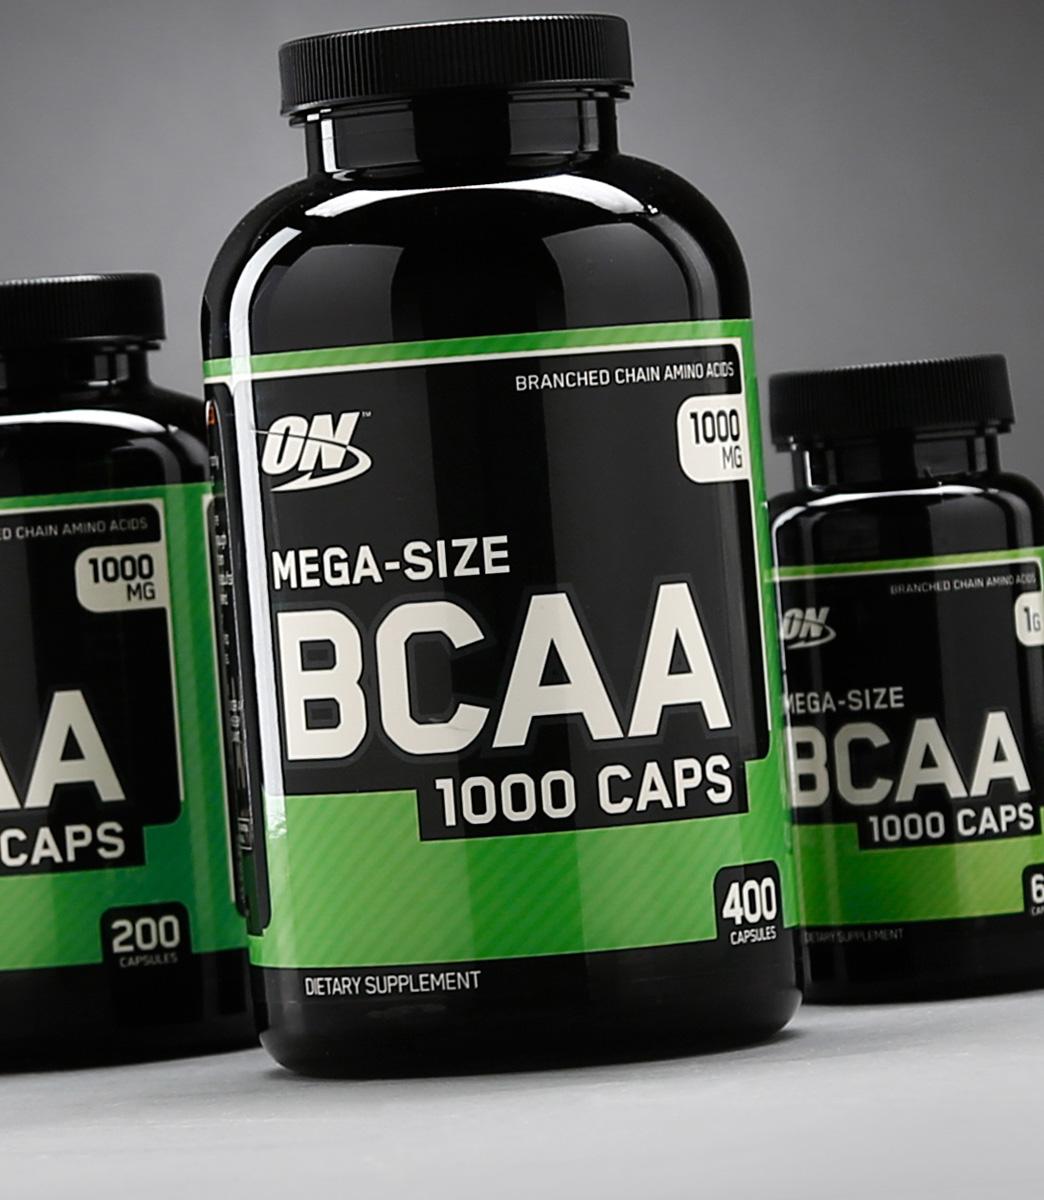 bcaa 1000 caps optimum nutrition 400 капсул купить